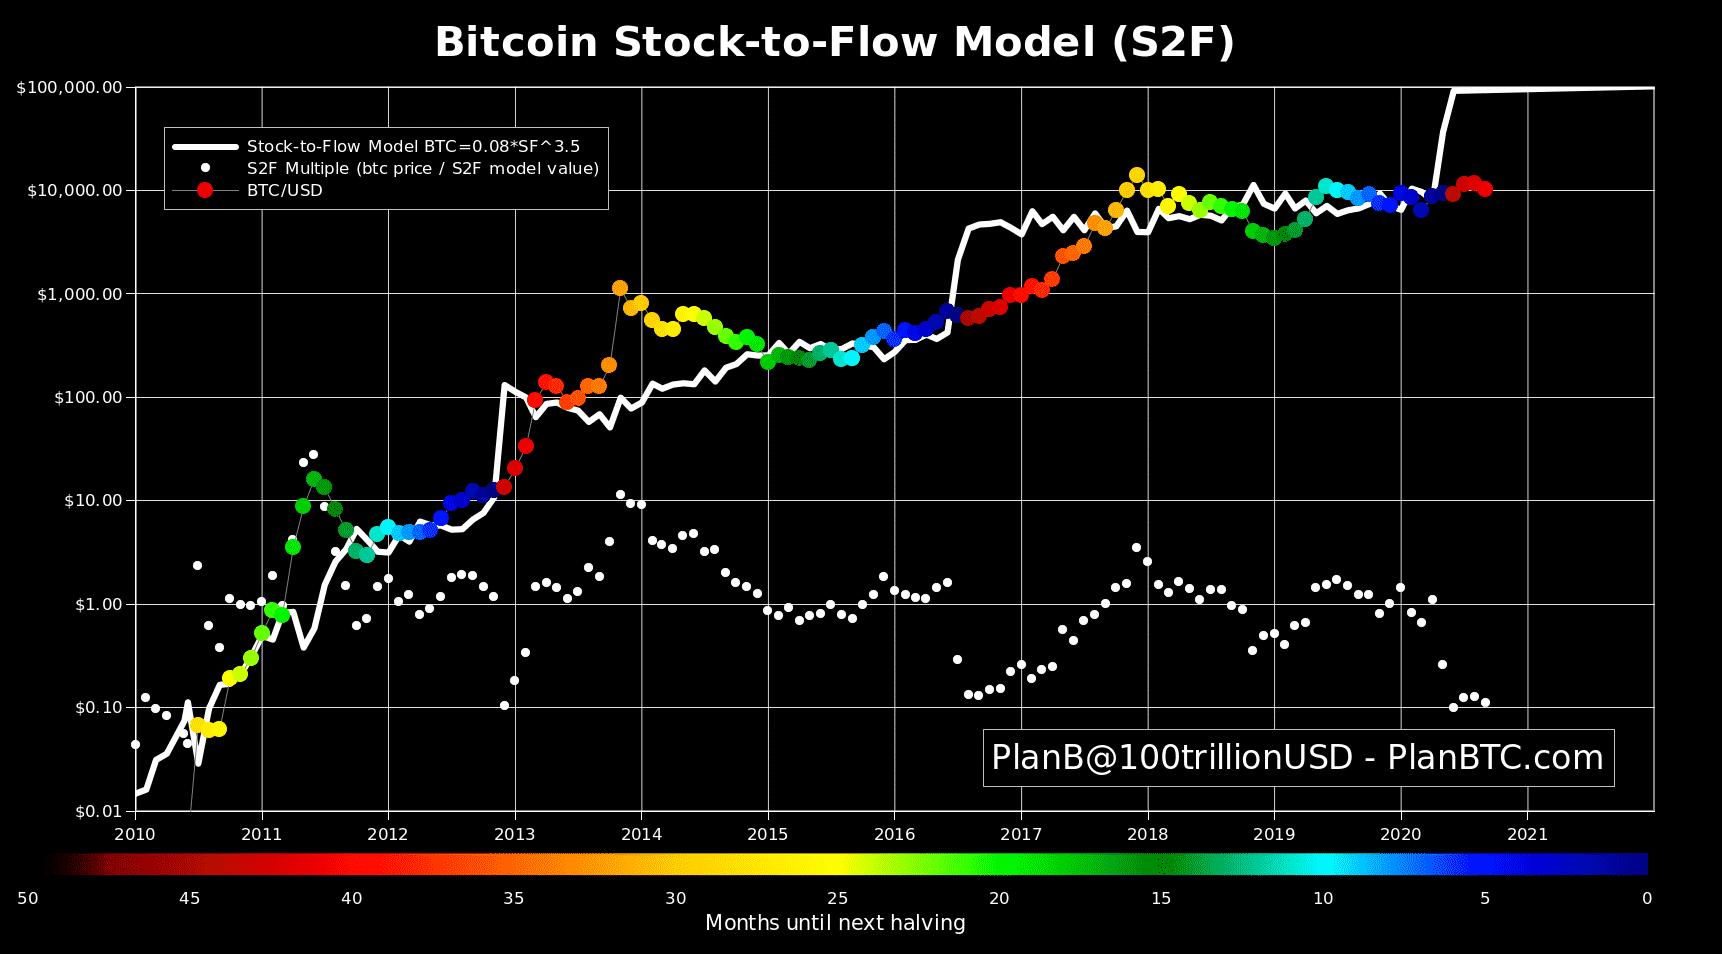 Bitcoin na začiatku parabolického trendu - Zdroj: PlanB Twitter